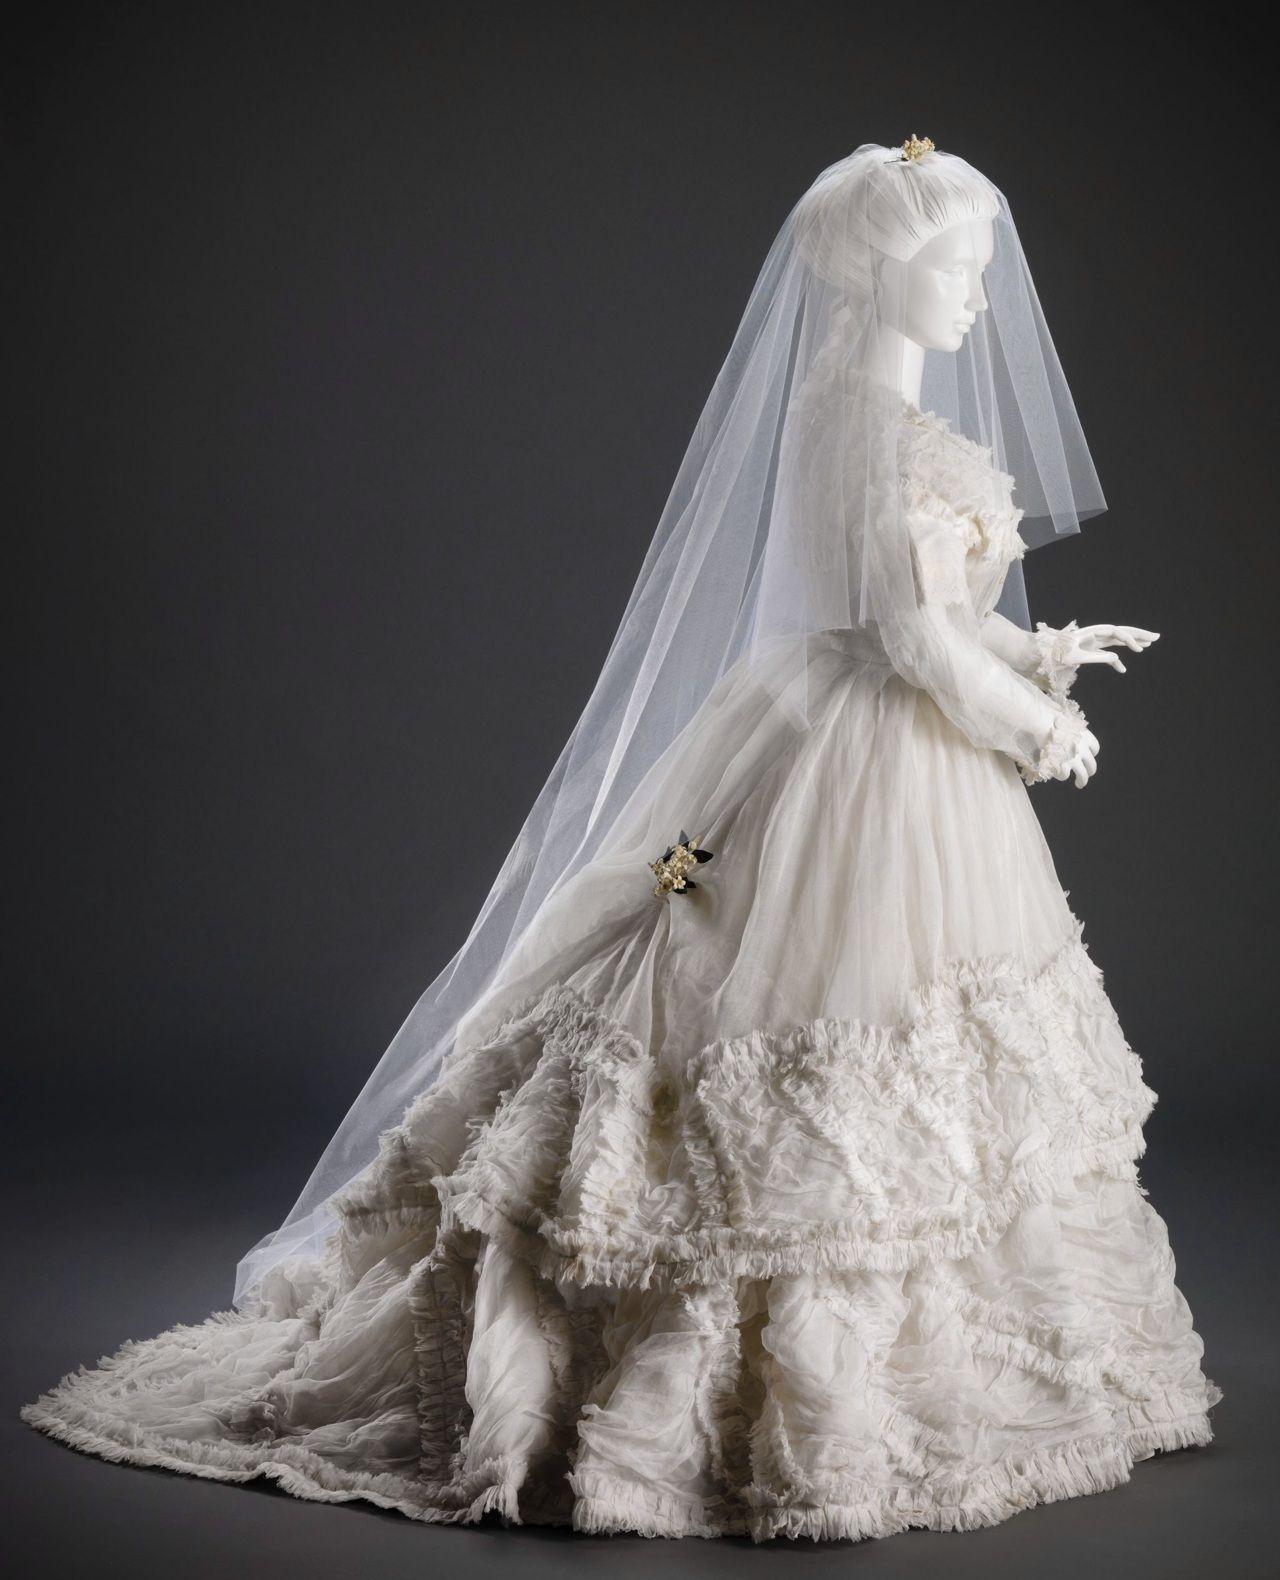 1870s Wedding Gown Courtesy Of The Cincinnati Art Museum Victorian Wedding Dress Wedding Gowns Vintage Victorian Wedding [ 1580 x 1280 Pixel ]